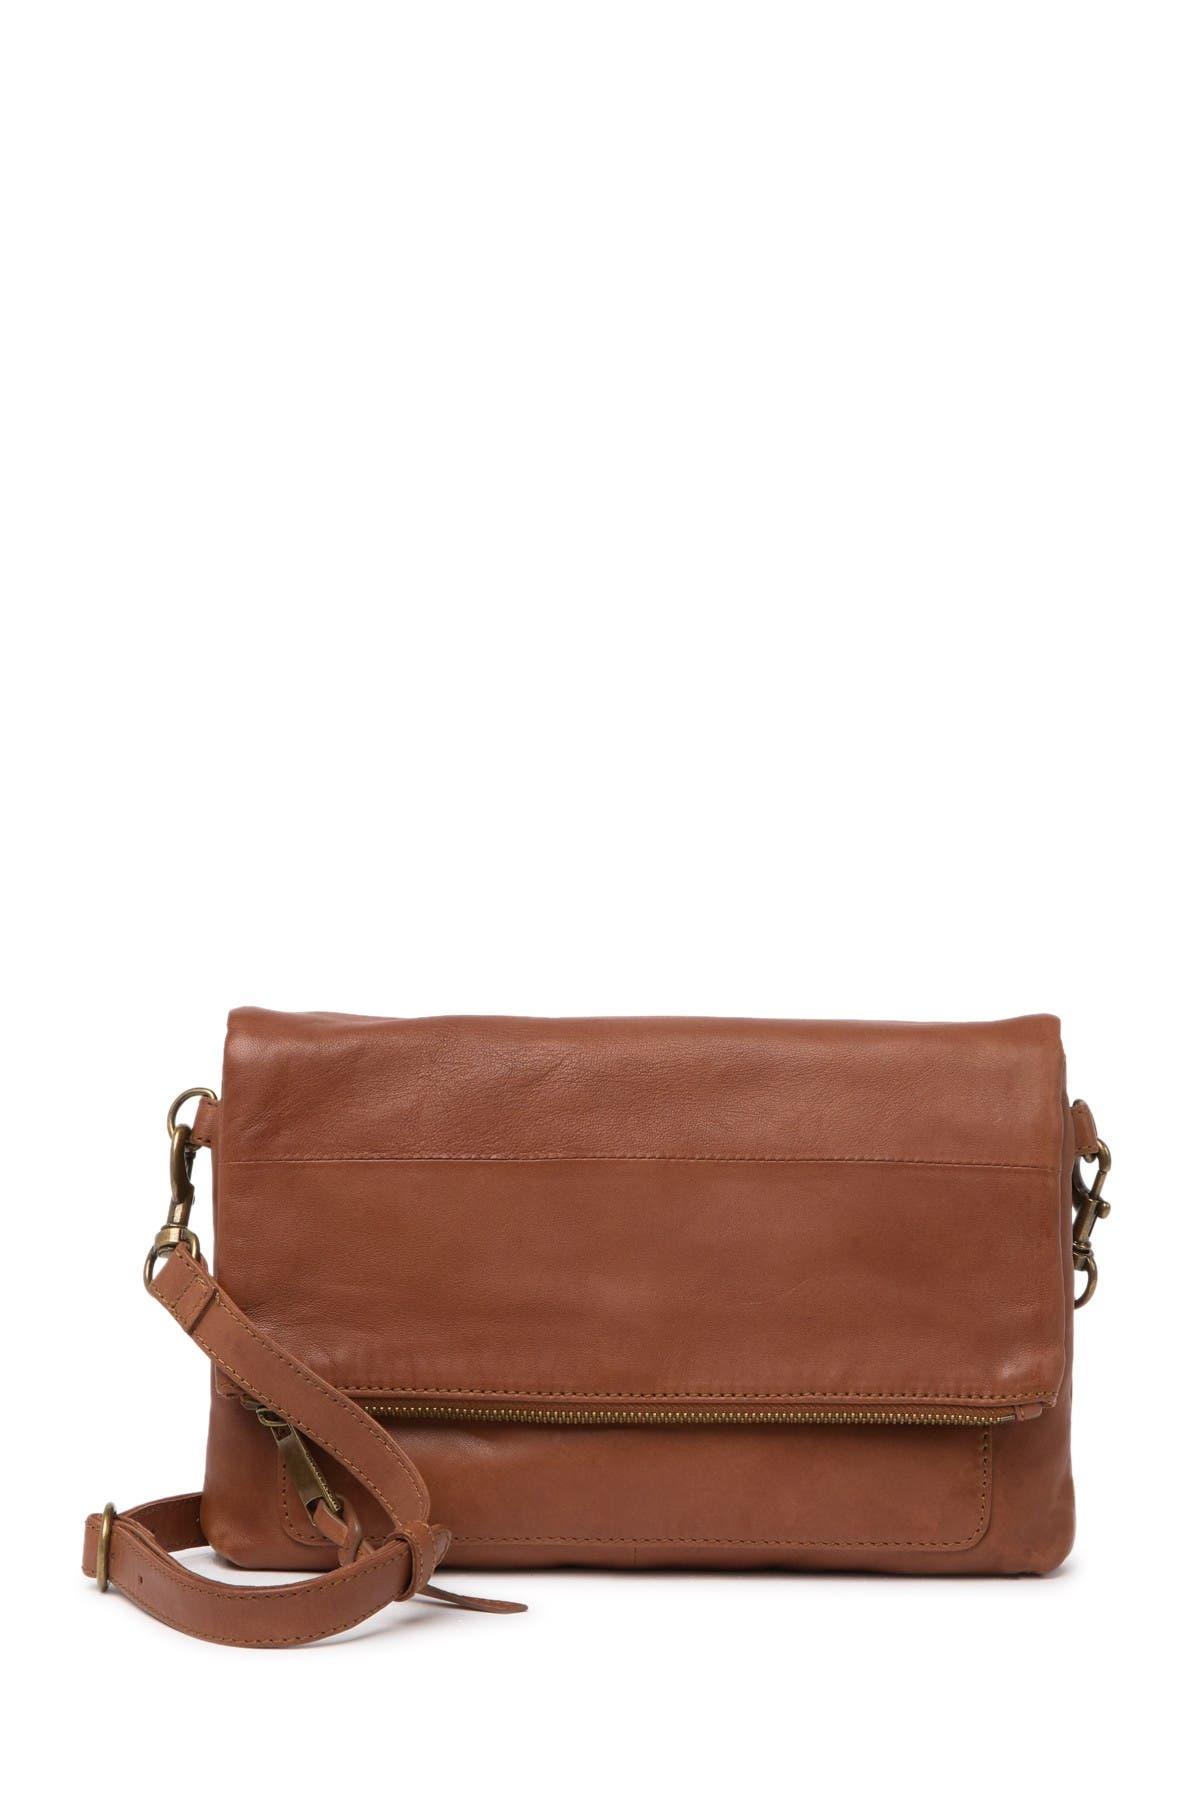 Image of Lucky Brand Caro Leather Flap Crossbody Bag